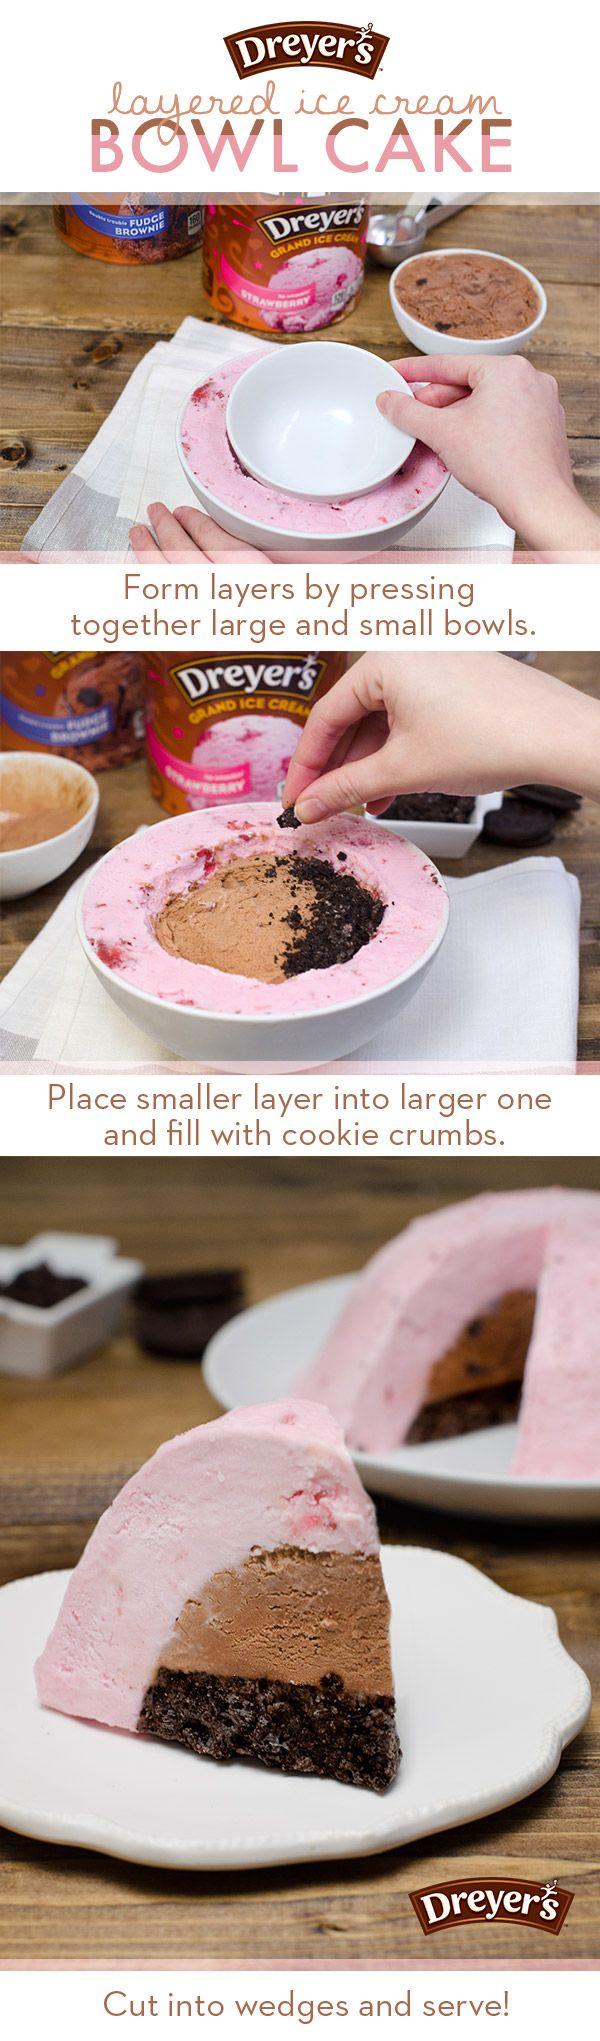 Layered Ice Cream Bowl Cake! Awesome!